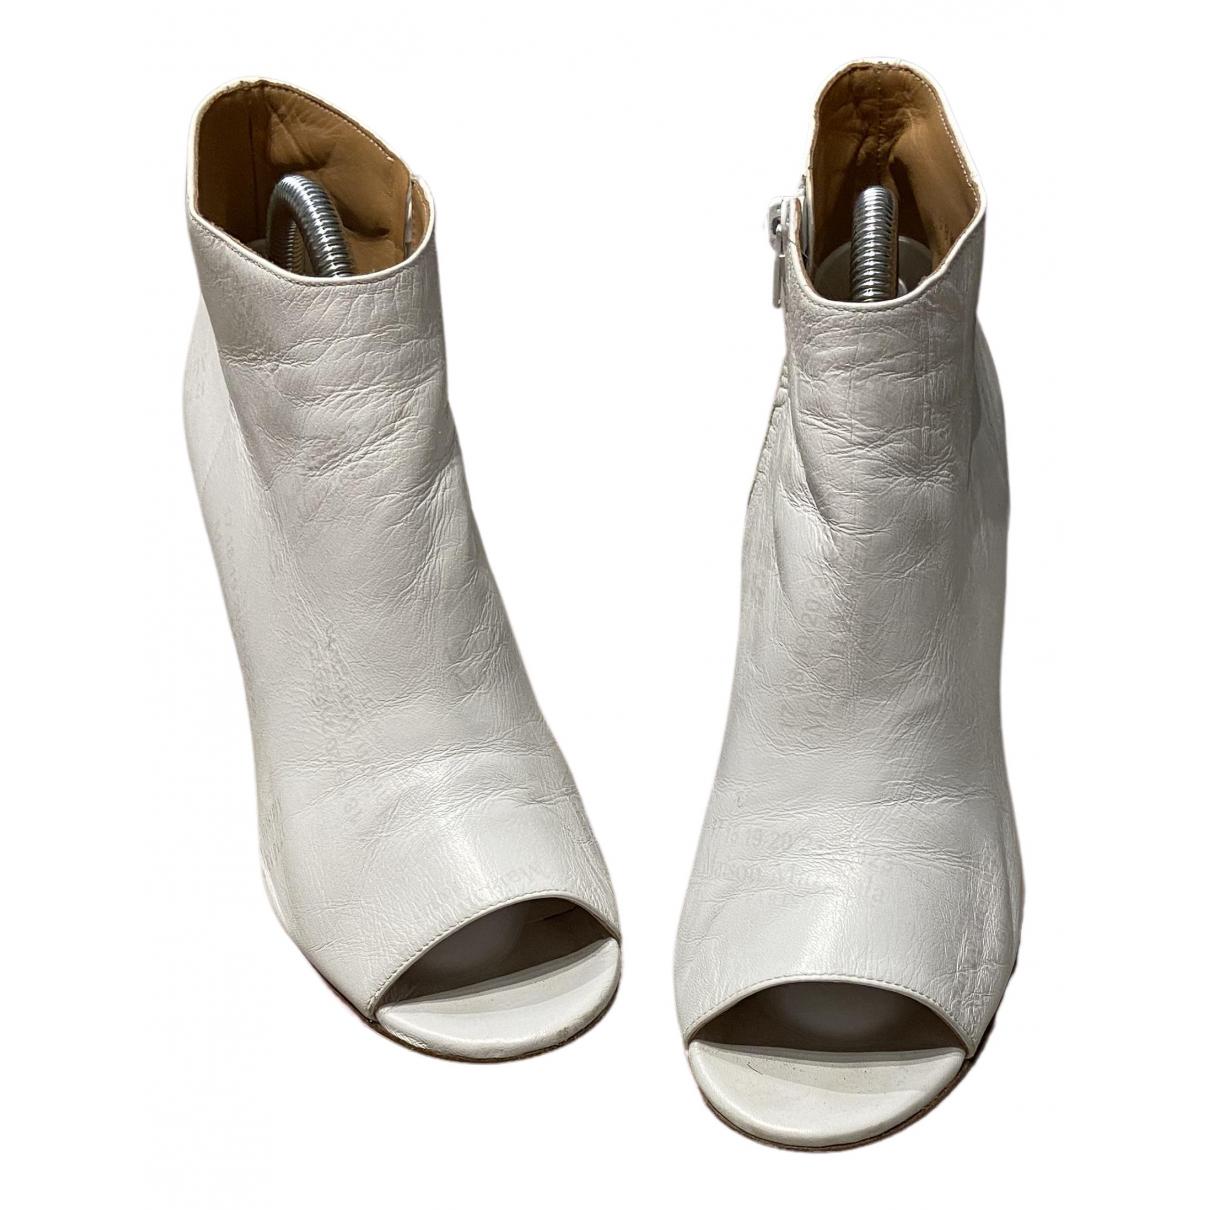 Maison Martin Margiela \N White Leather Ankle boots for Women 37 EU